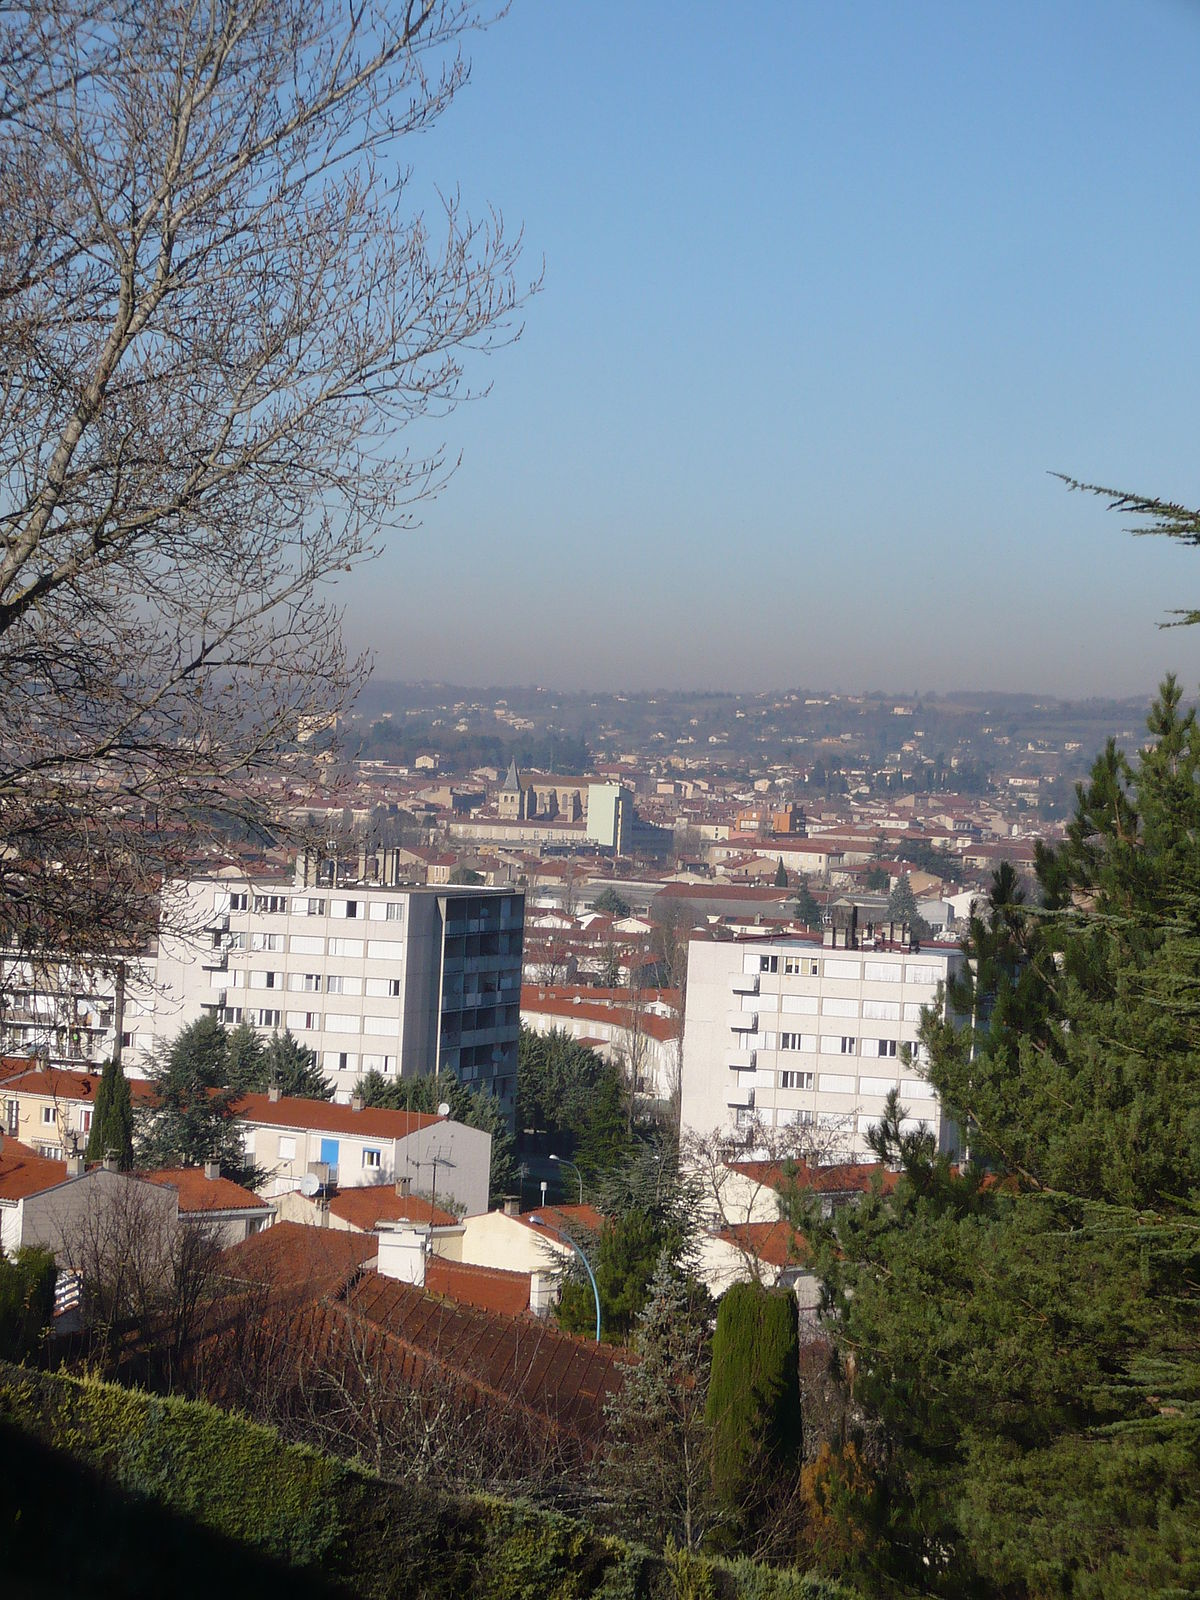 Unité urbaine de Castres — Wikipédia